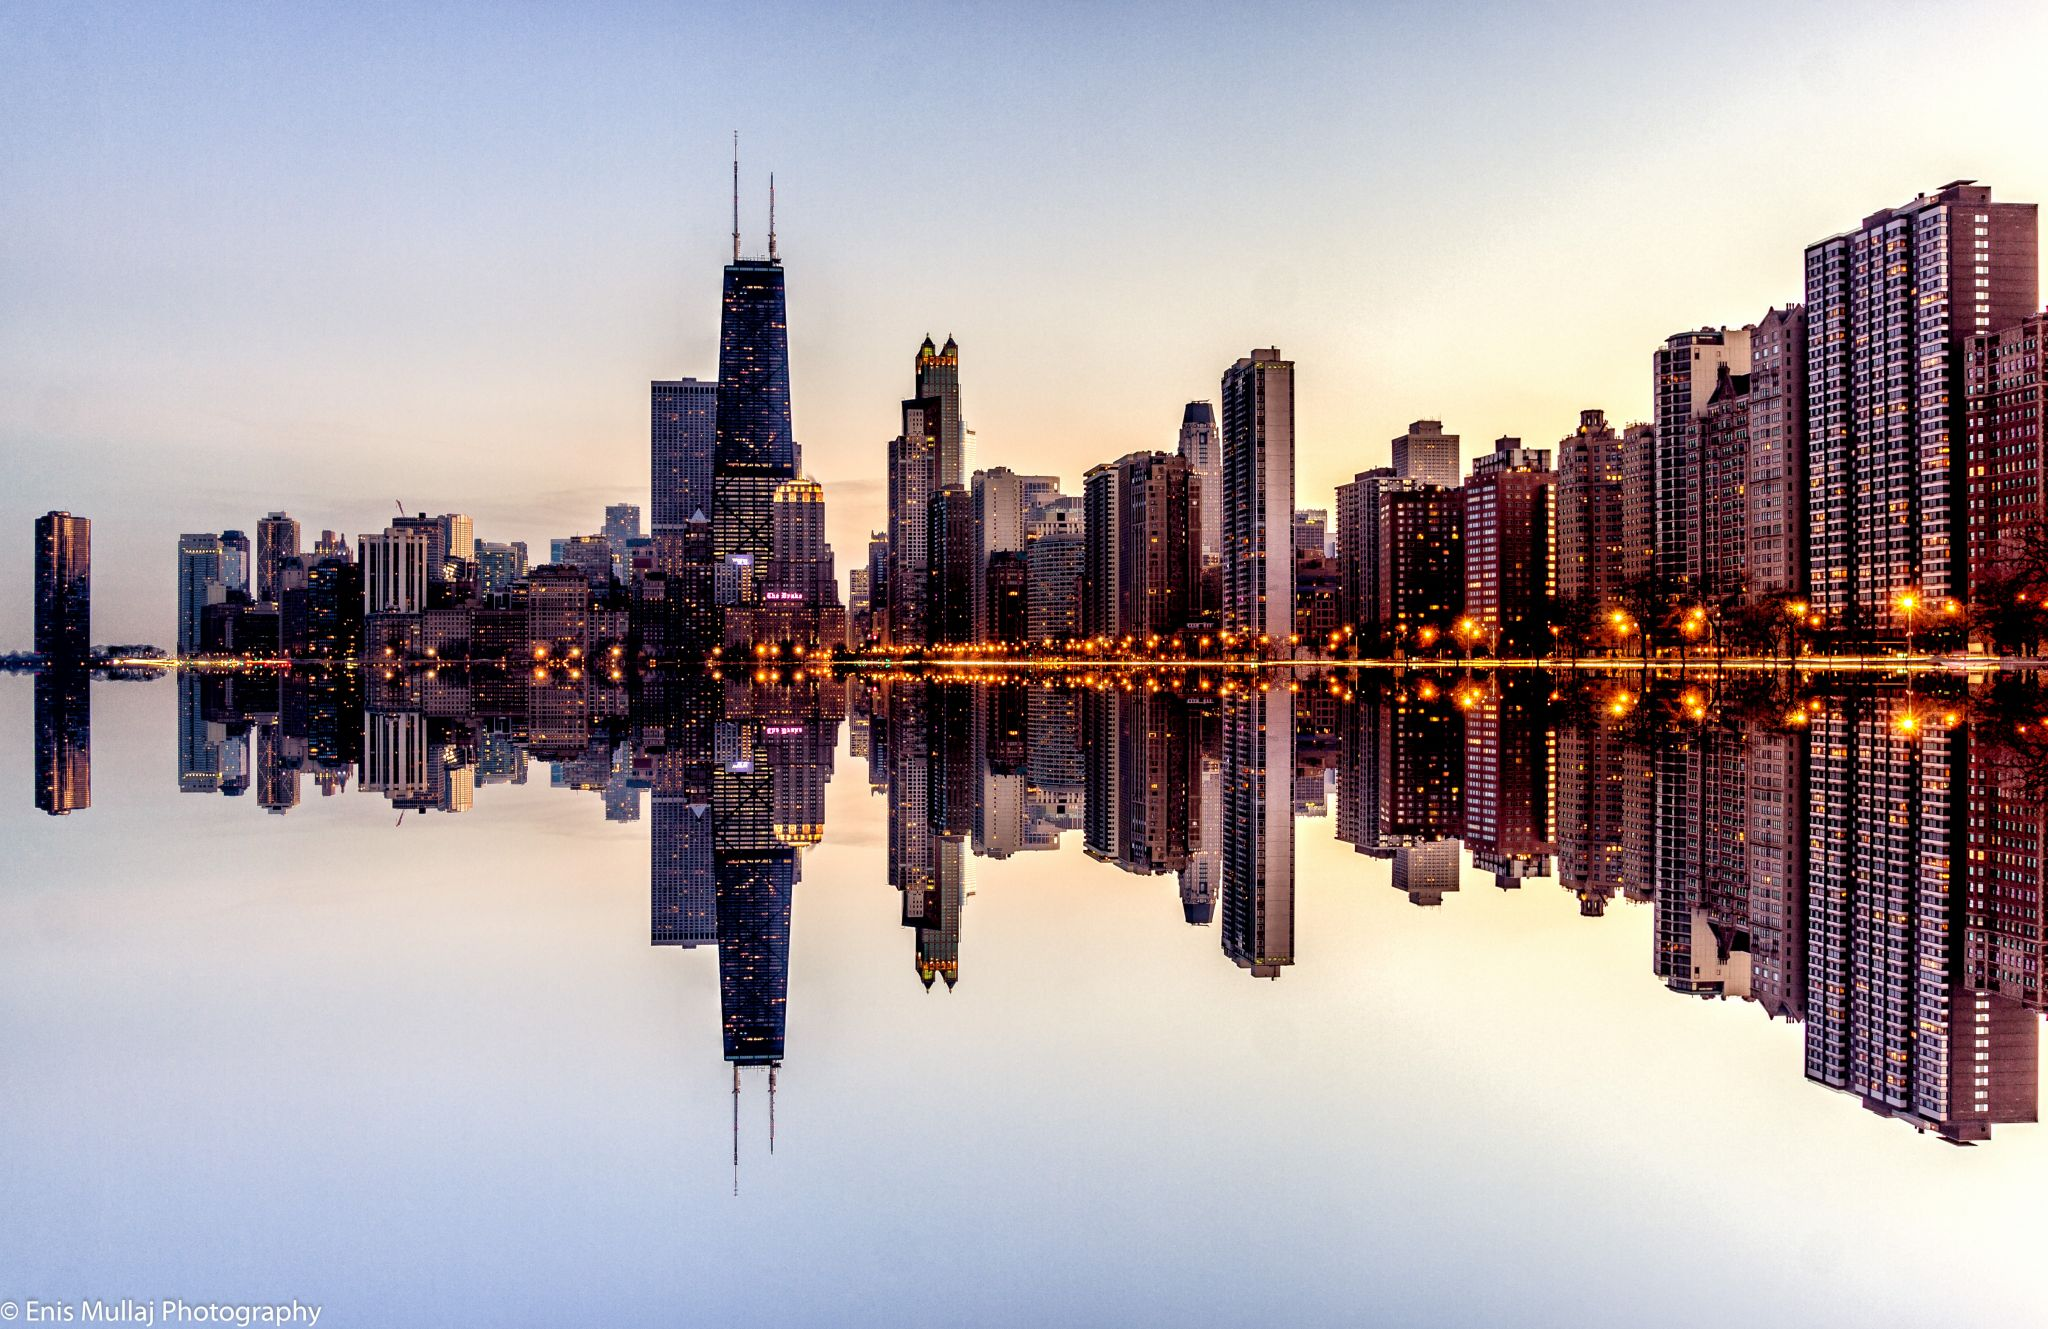 Chicagos Reflection, USA